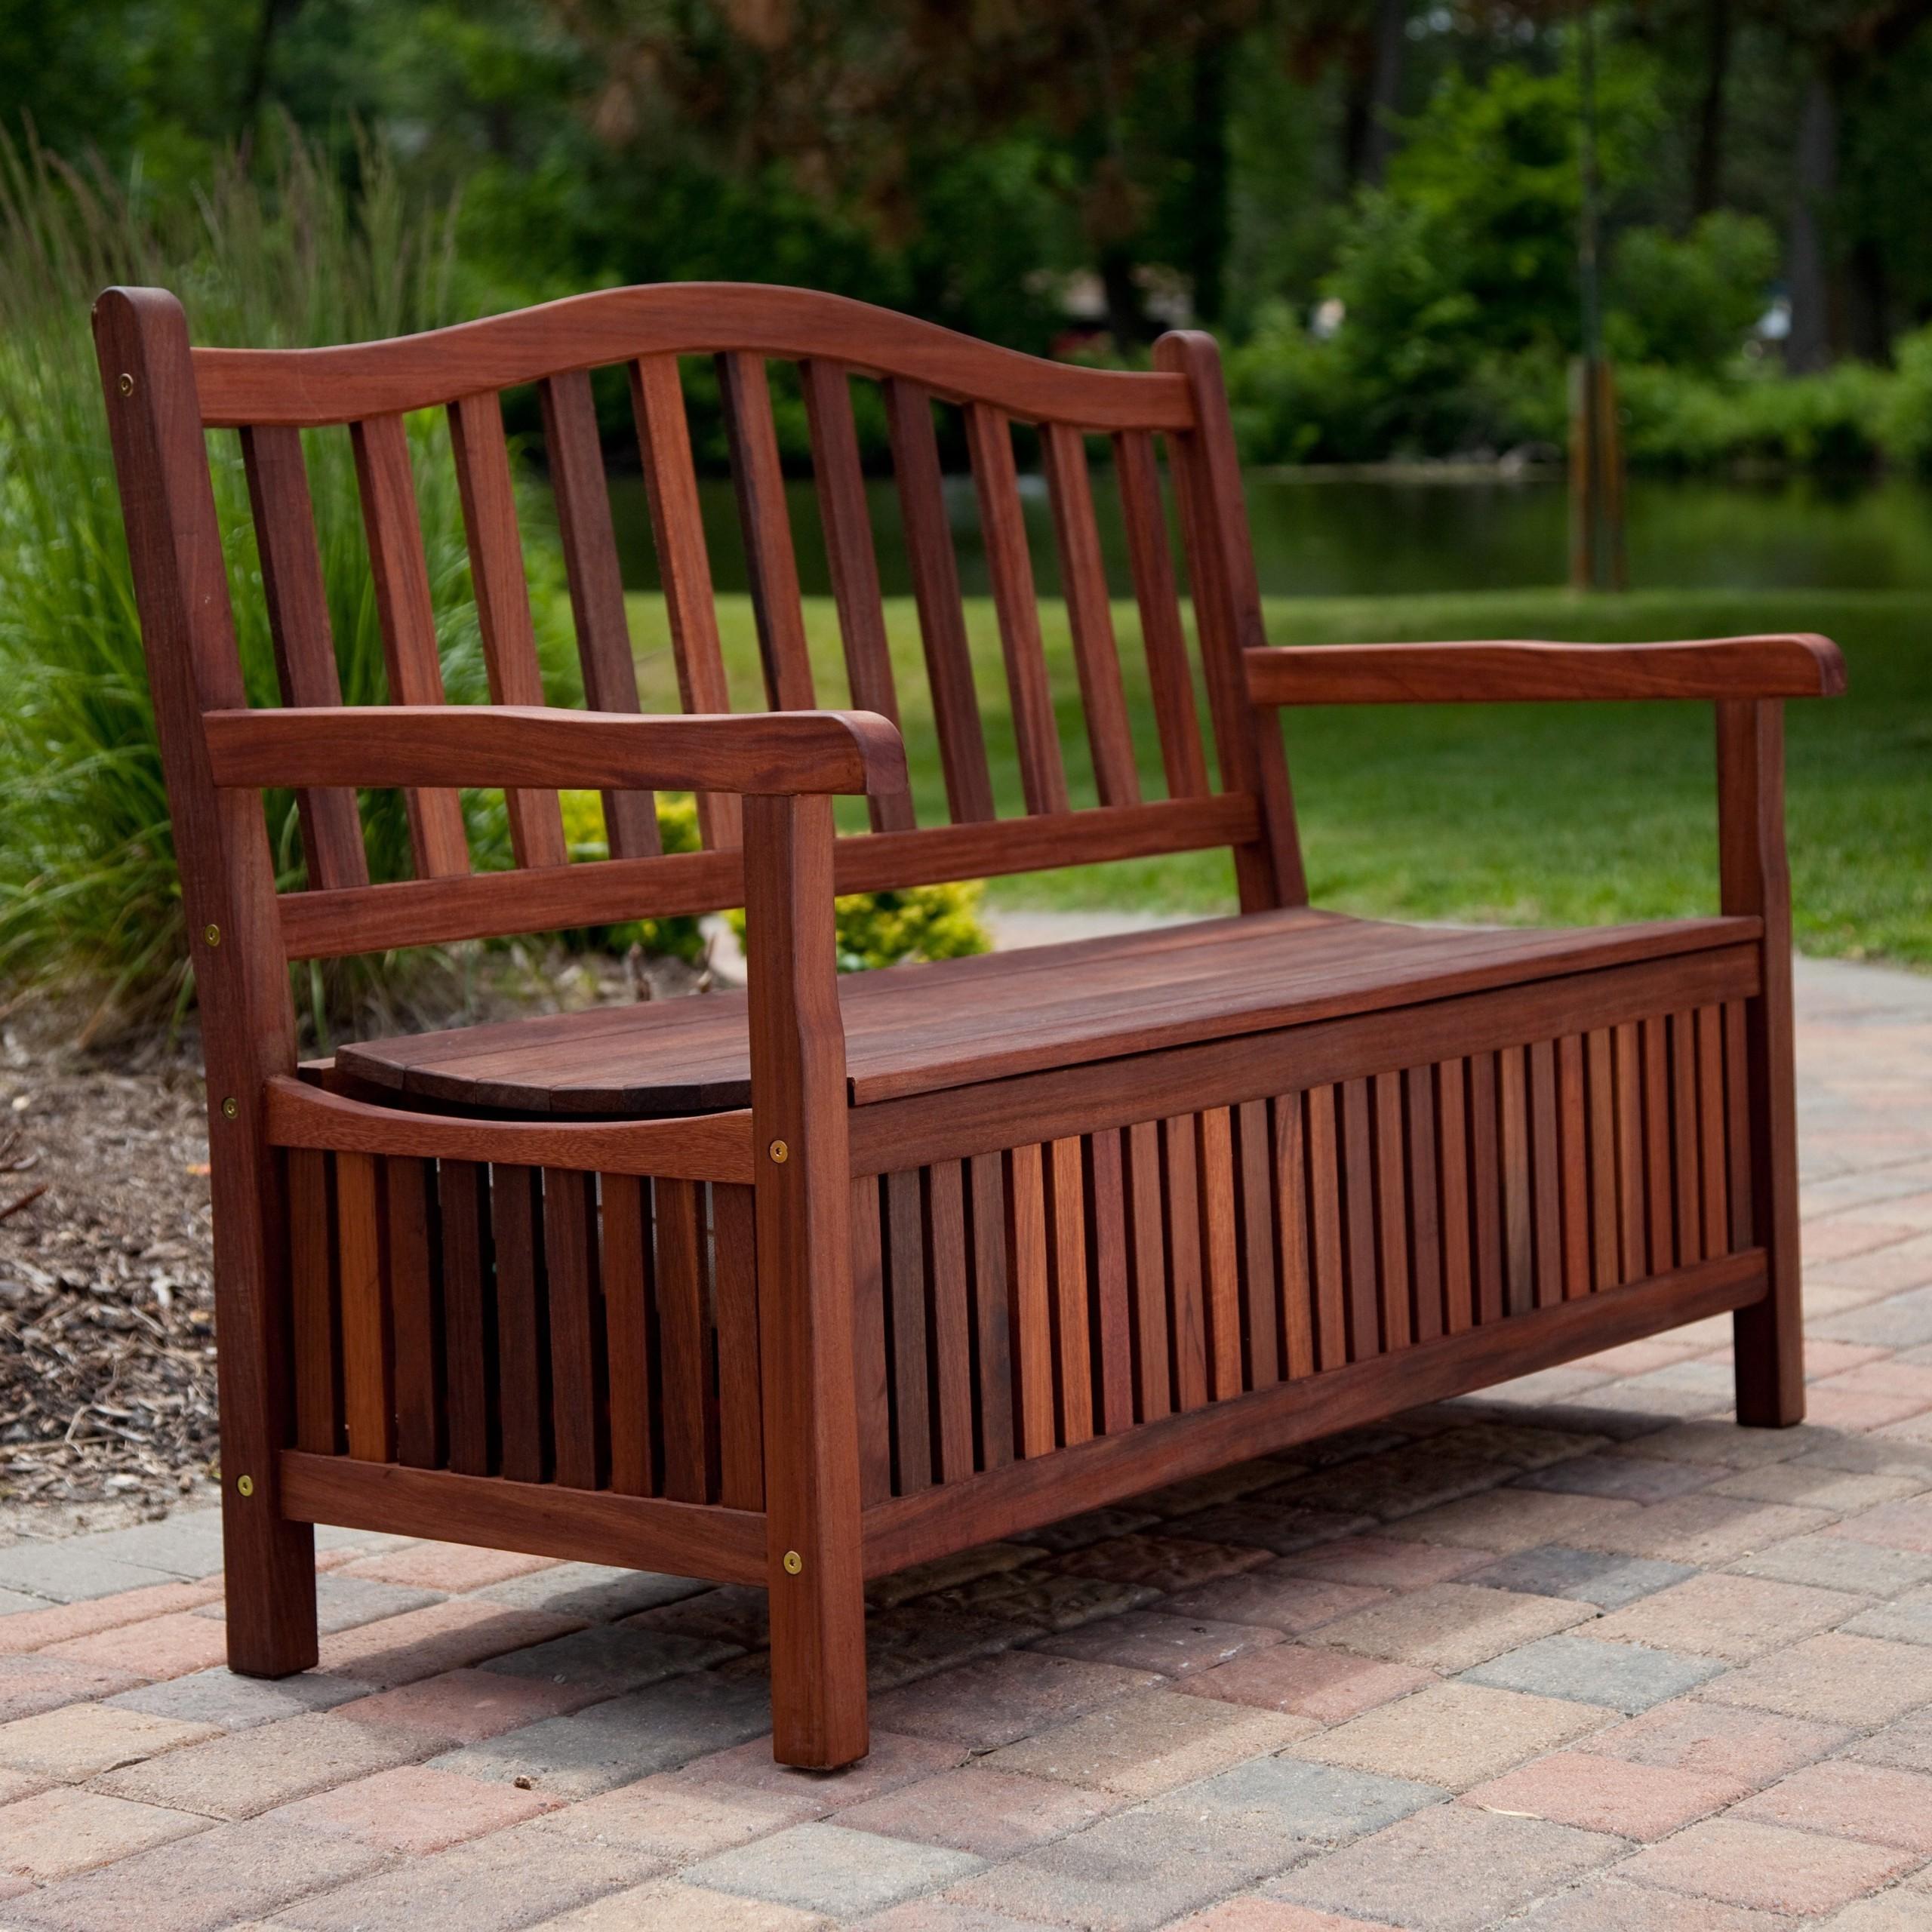 Regal Looking Comfy Seat Cum Storage Bench 500x500